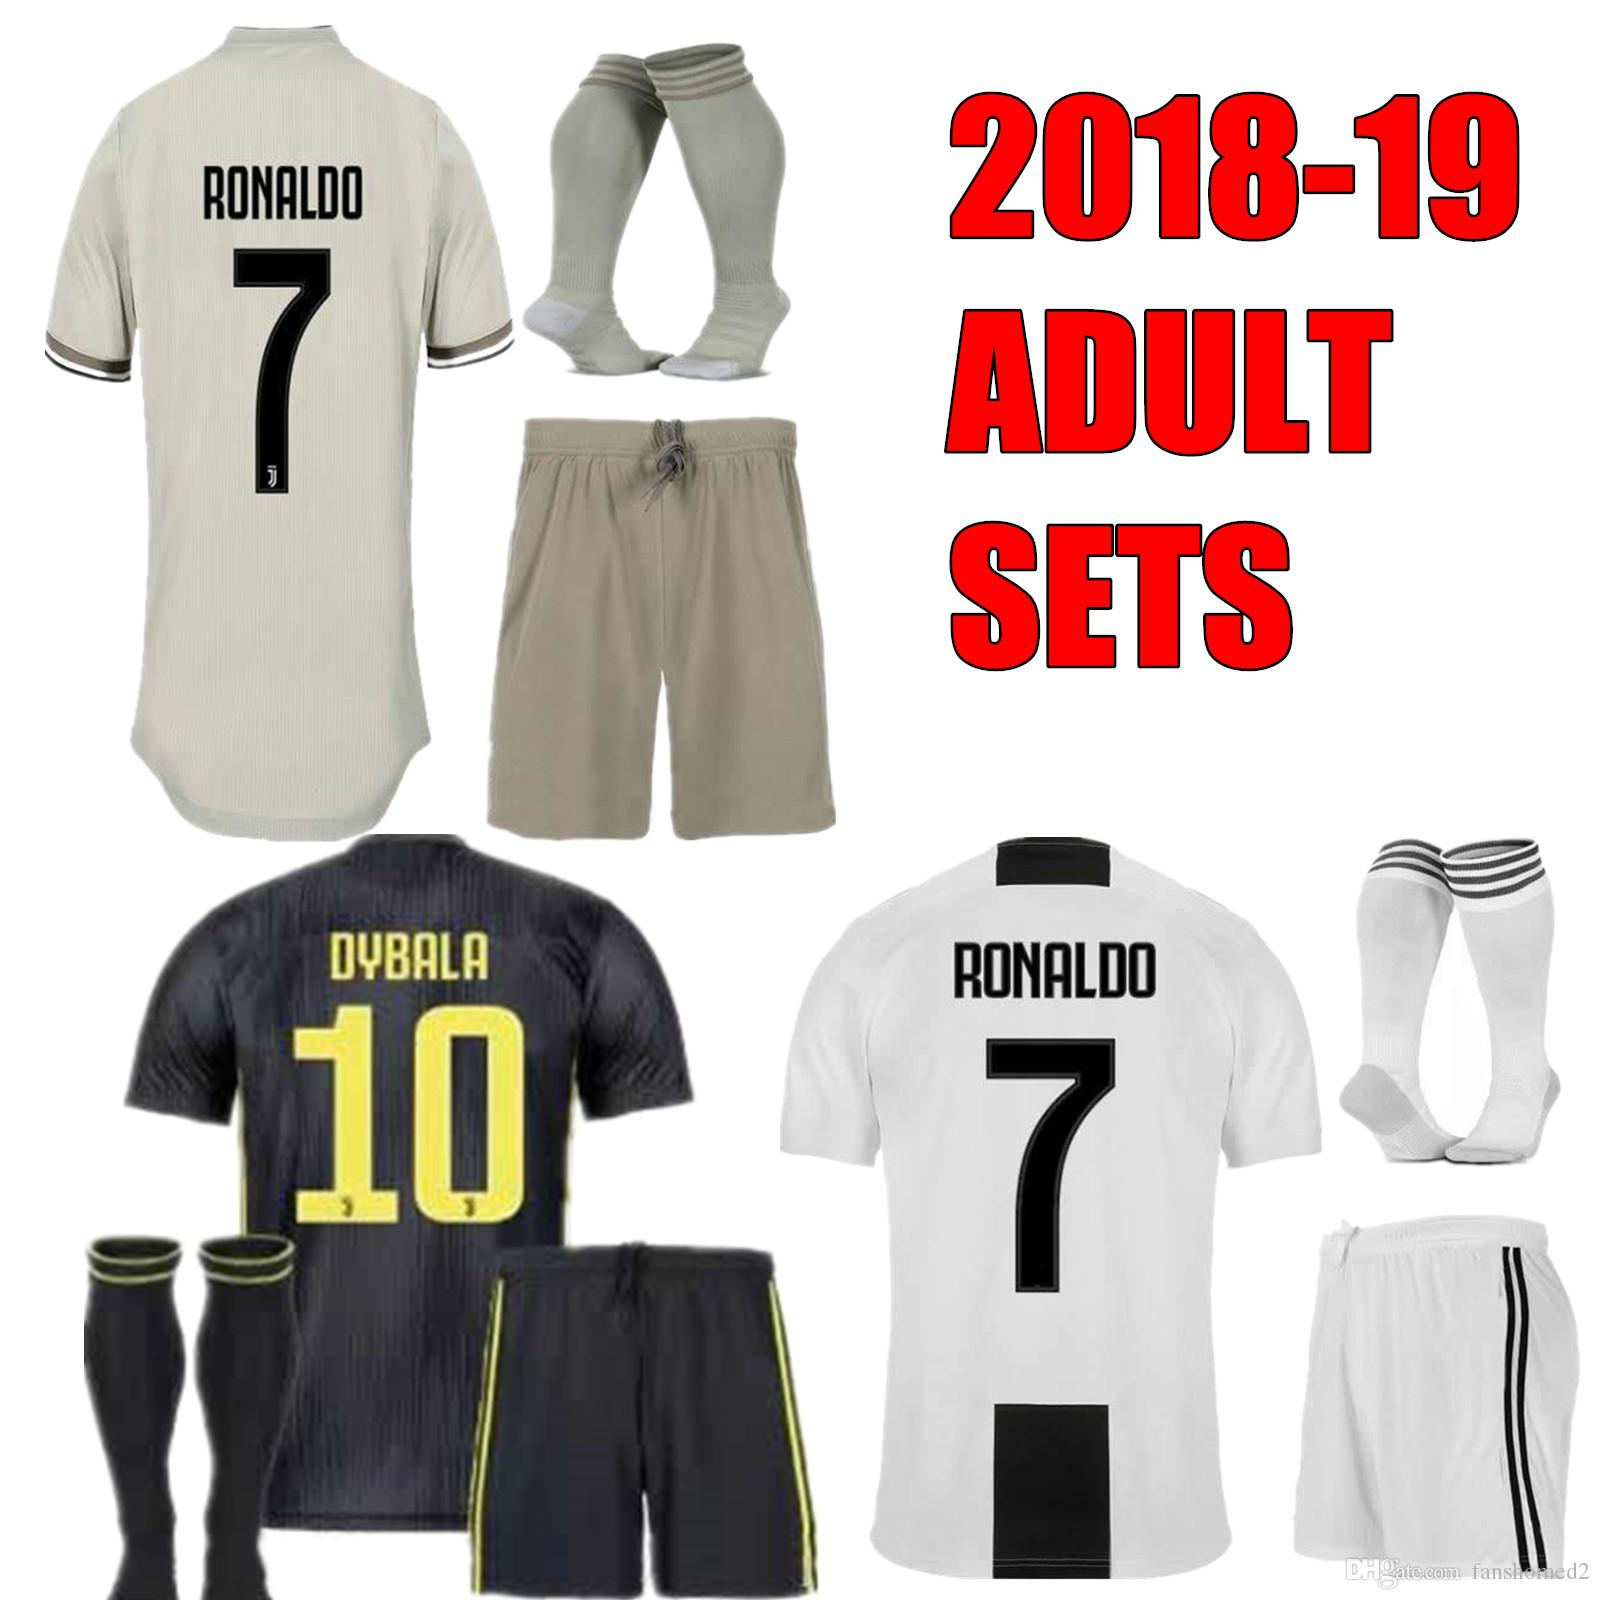 0d4e0a95d 2019 2018 19 Men Kit Juventus DYBALA 10 Ronaldo  7 Soccer Jersey Home Away  Gold Third HIGUAIN Uniform MARCHISIO KHEDIRA Football Adults Kits Set From  ...